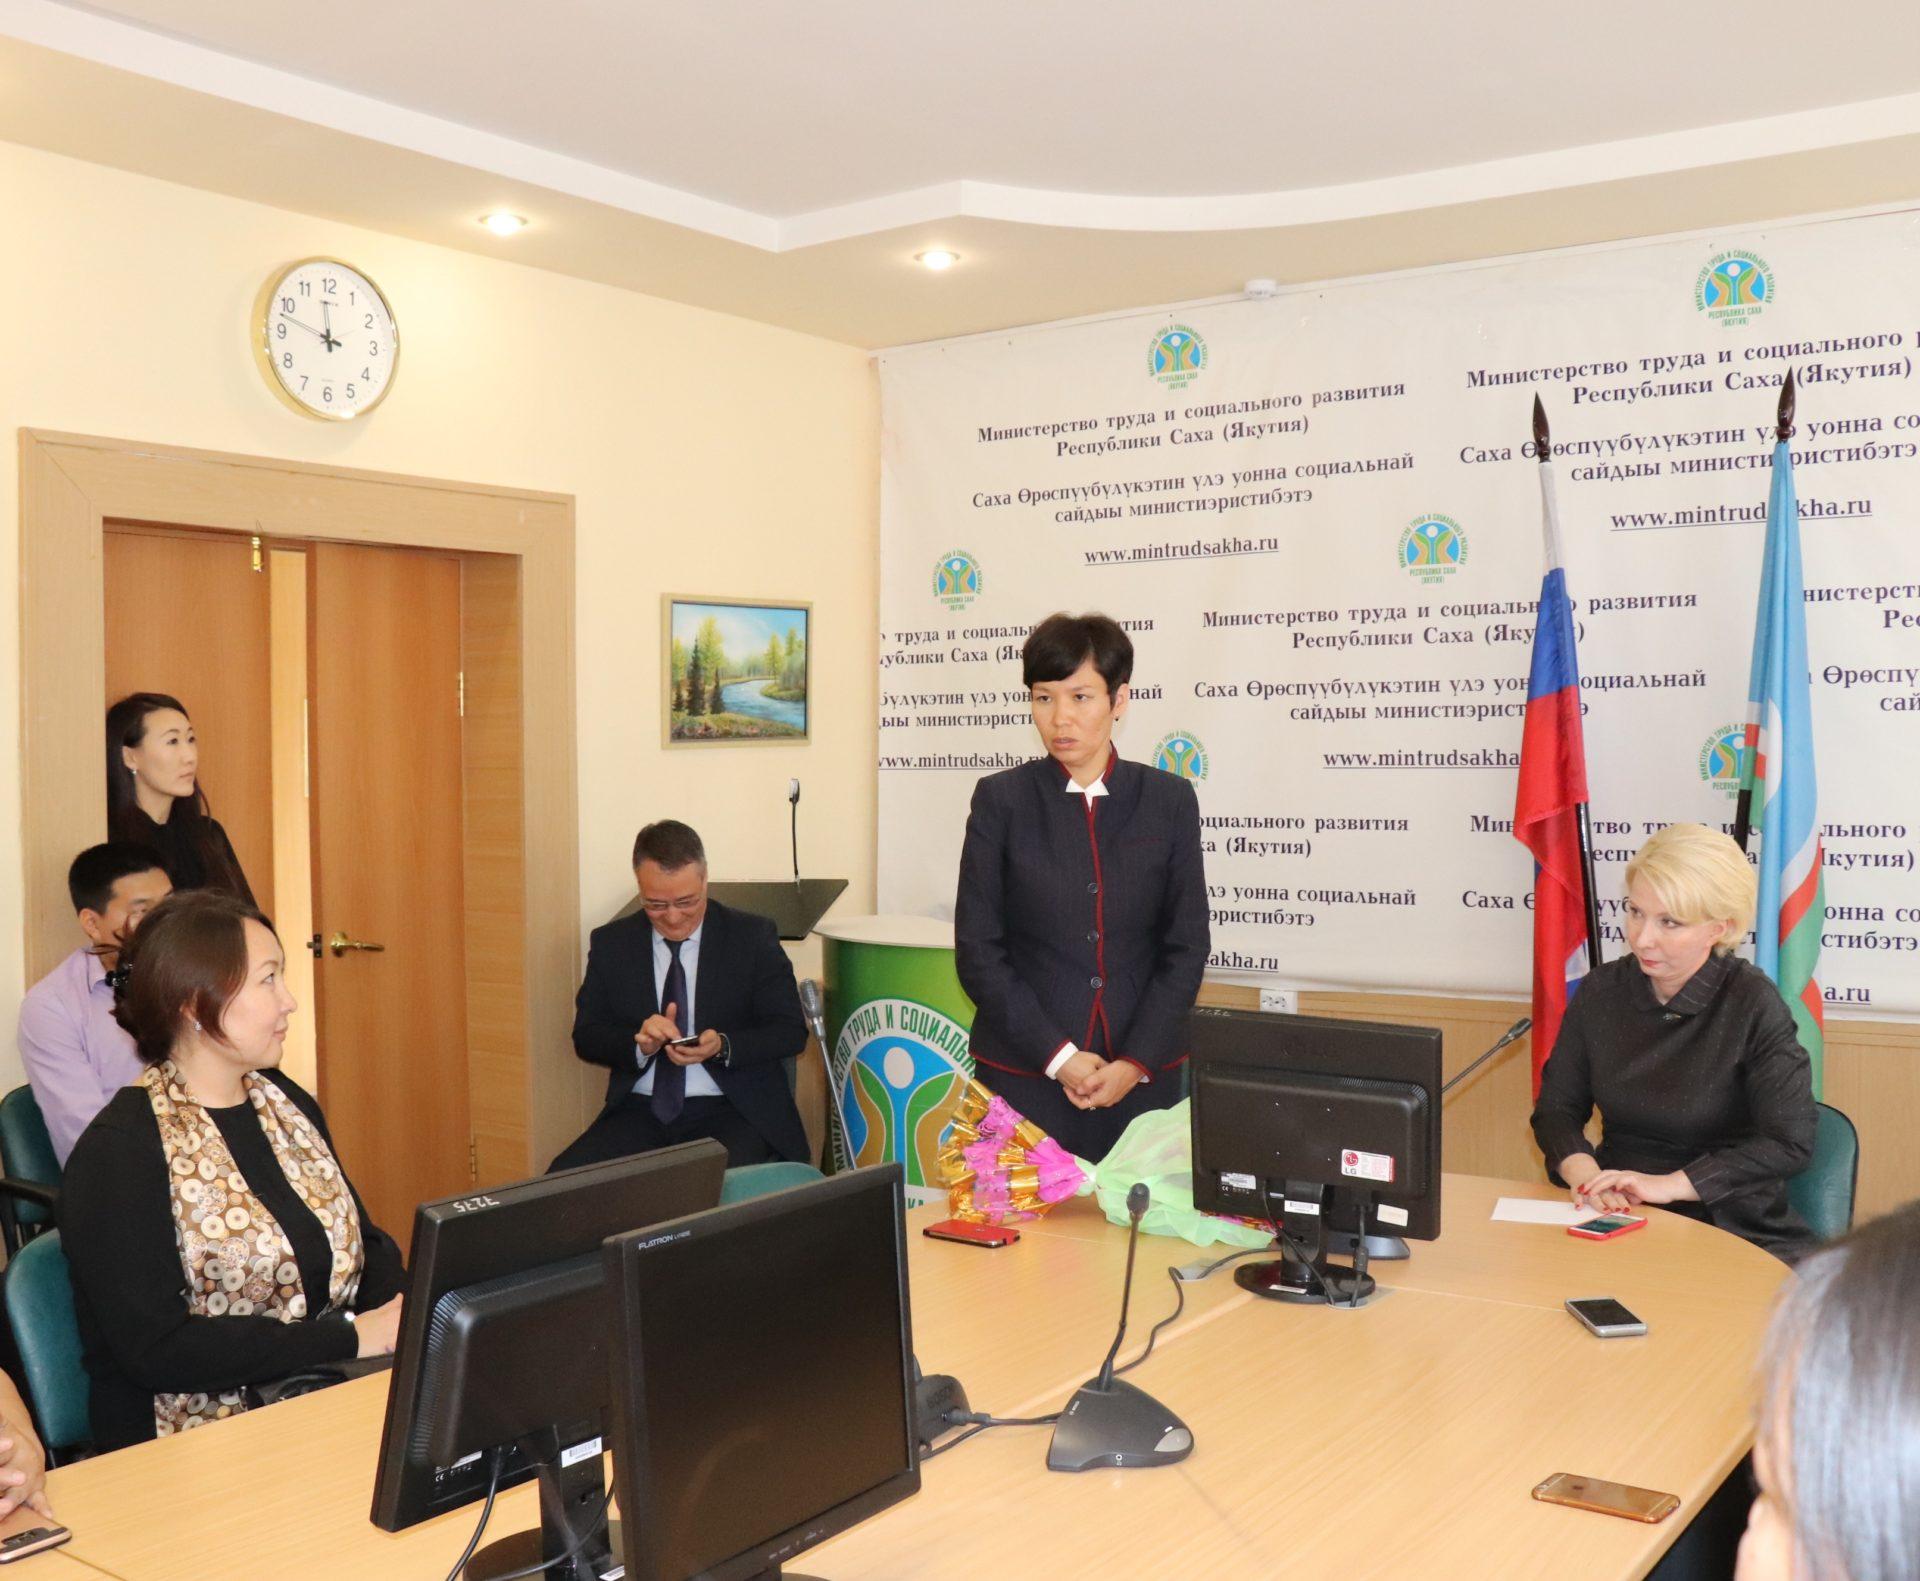 Ольга Балабкина представила коллективу Минтруда Якутии нового министра Елену Волкову